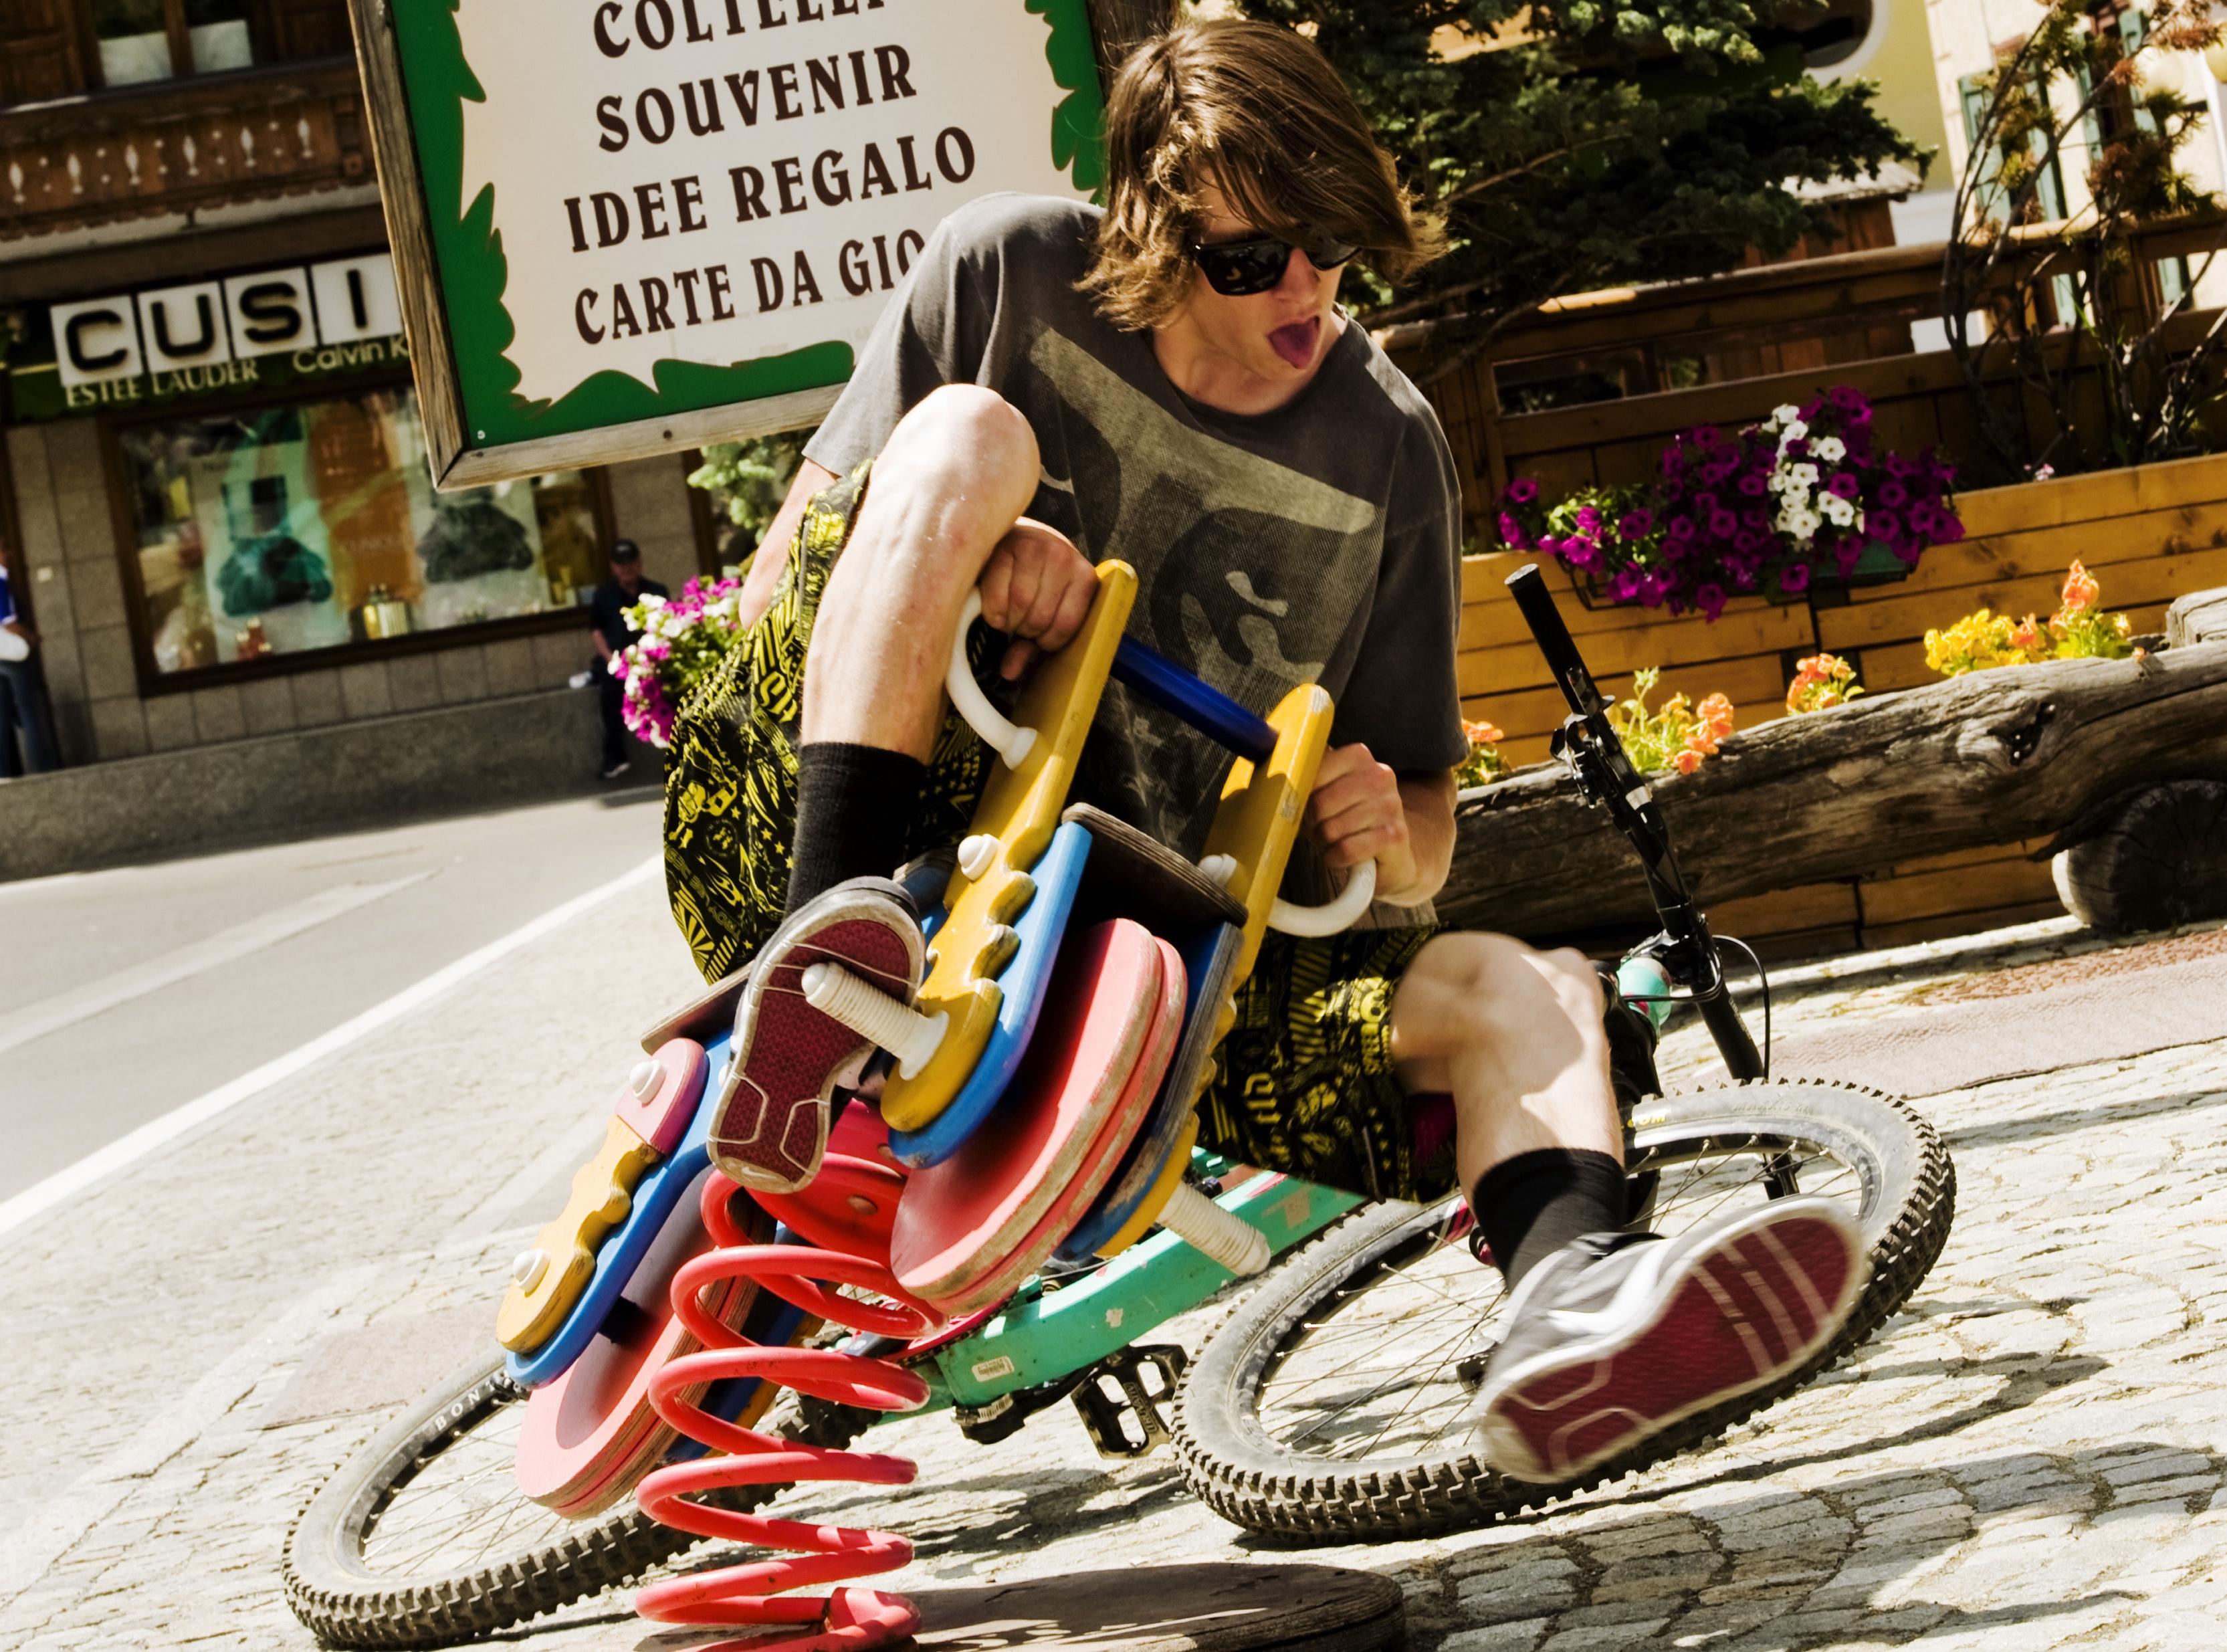 Bikepark, emozioni ed adrenalina ad alta quota